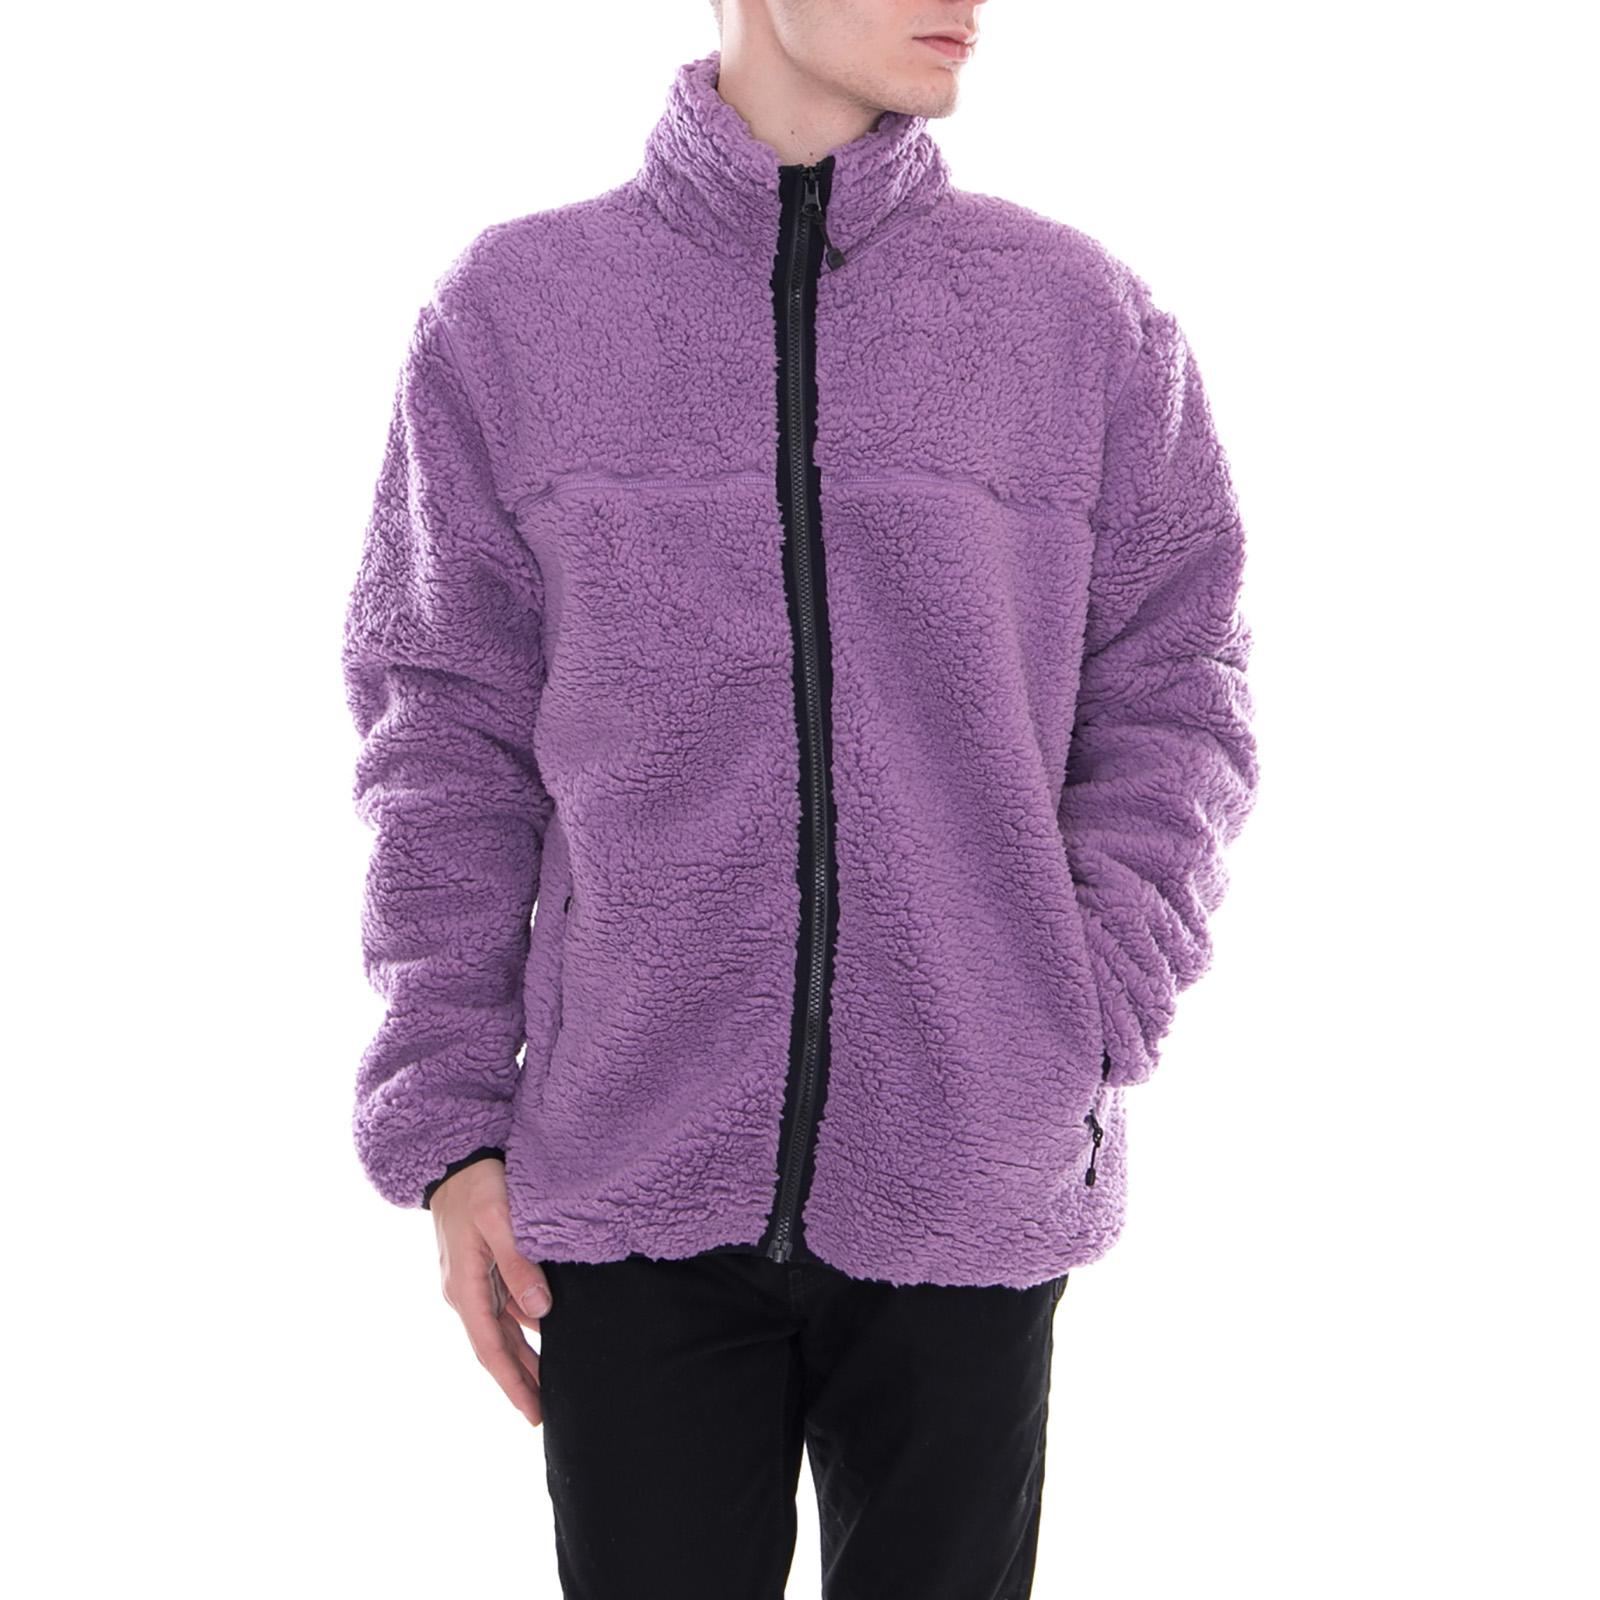 43edca11d Details about Stussy Jackets Sherpa Mock Purple